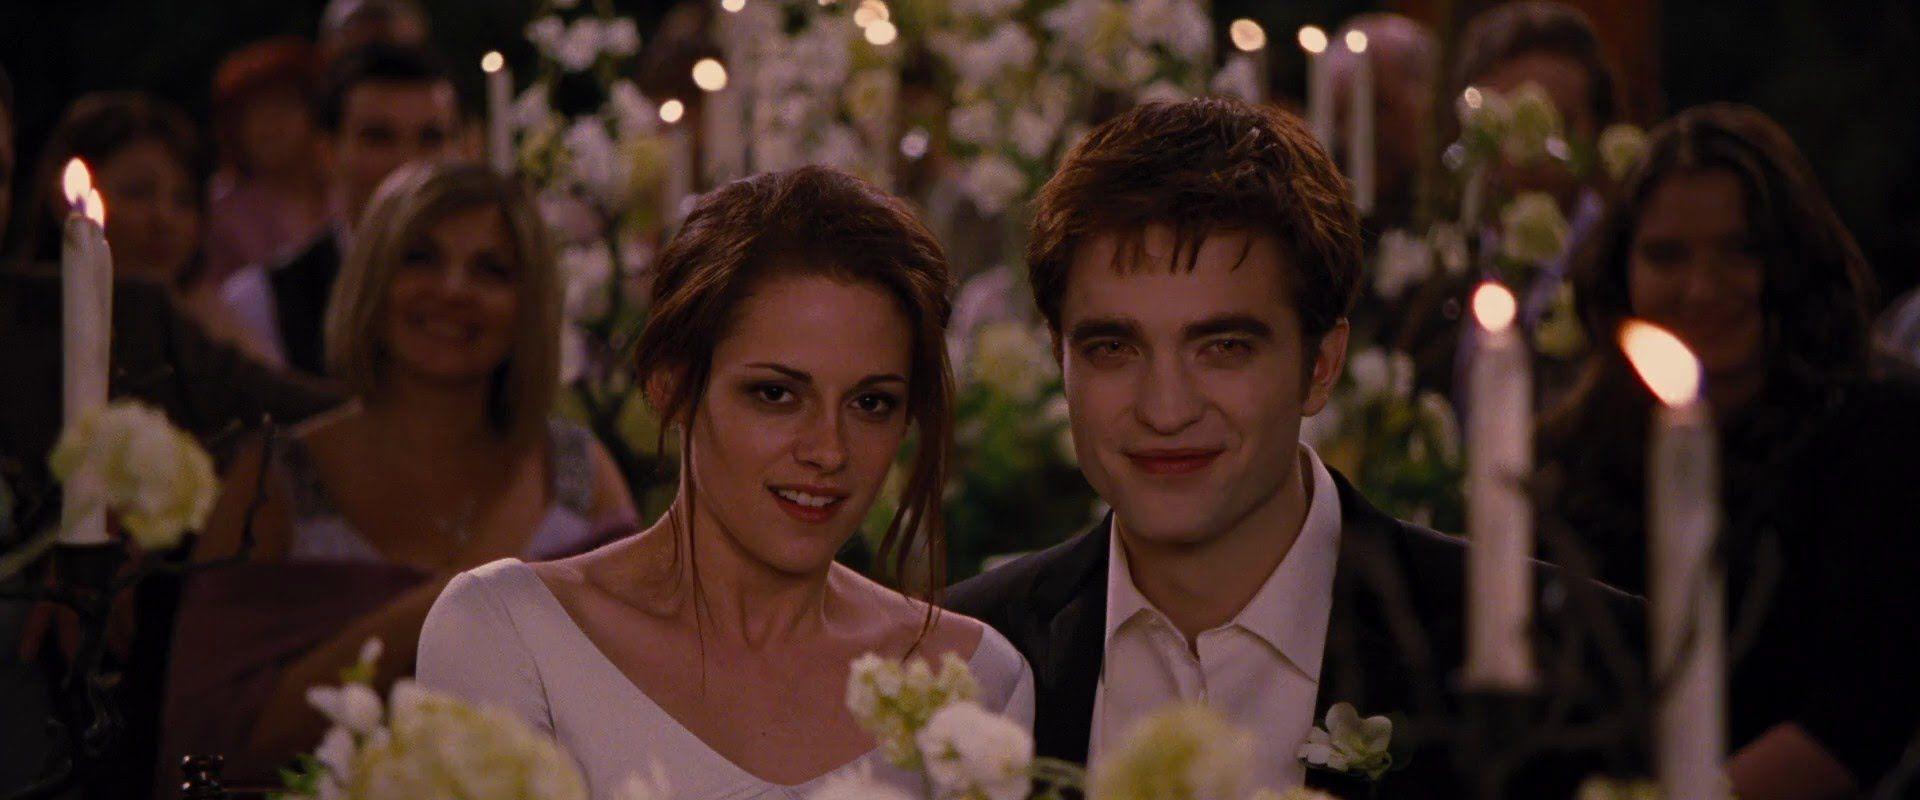 Crepusculo Amanecer Parte 1 Espanol Latino Pelicula Completa Twilight Breaking Dawn Twilight Saga Breaking Dawn